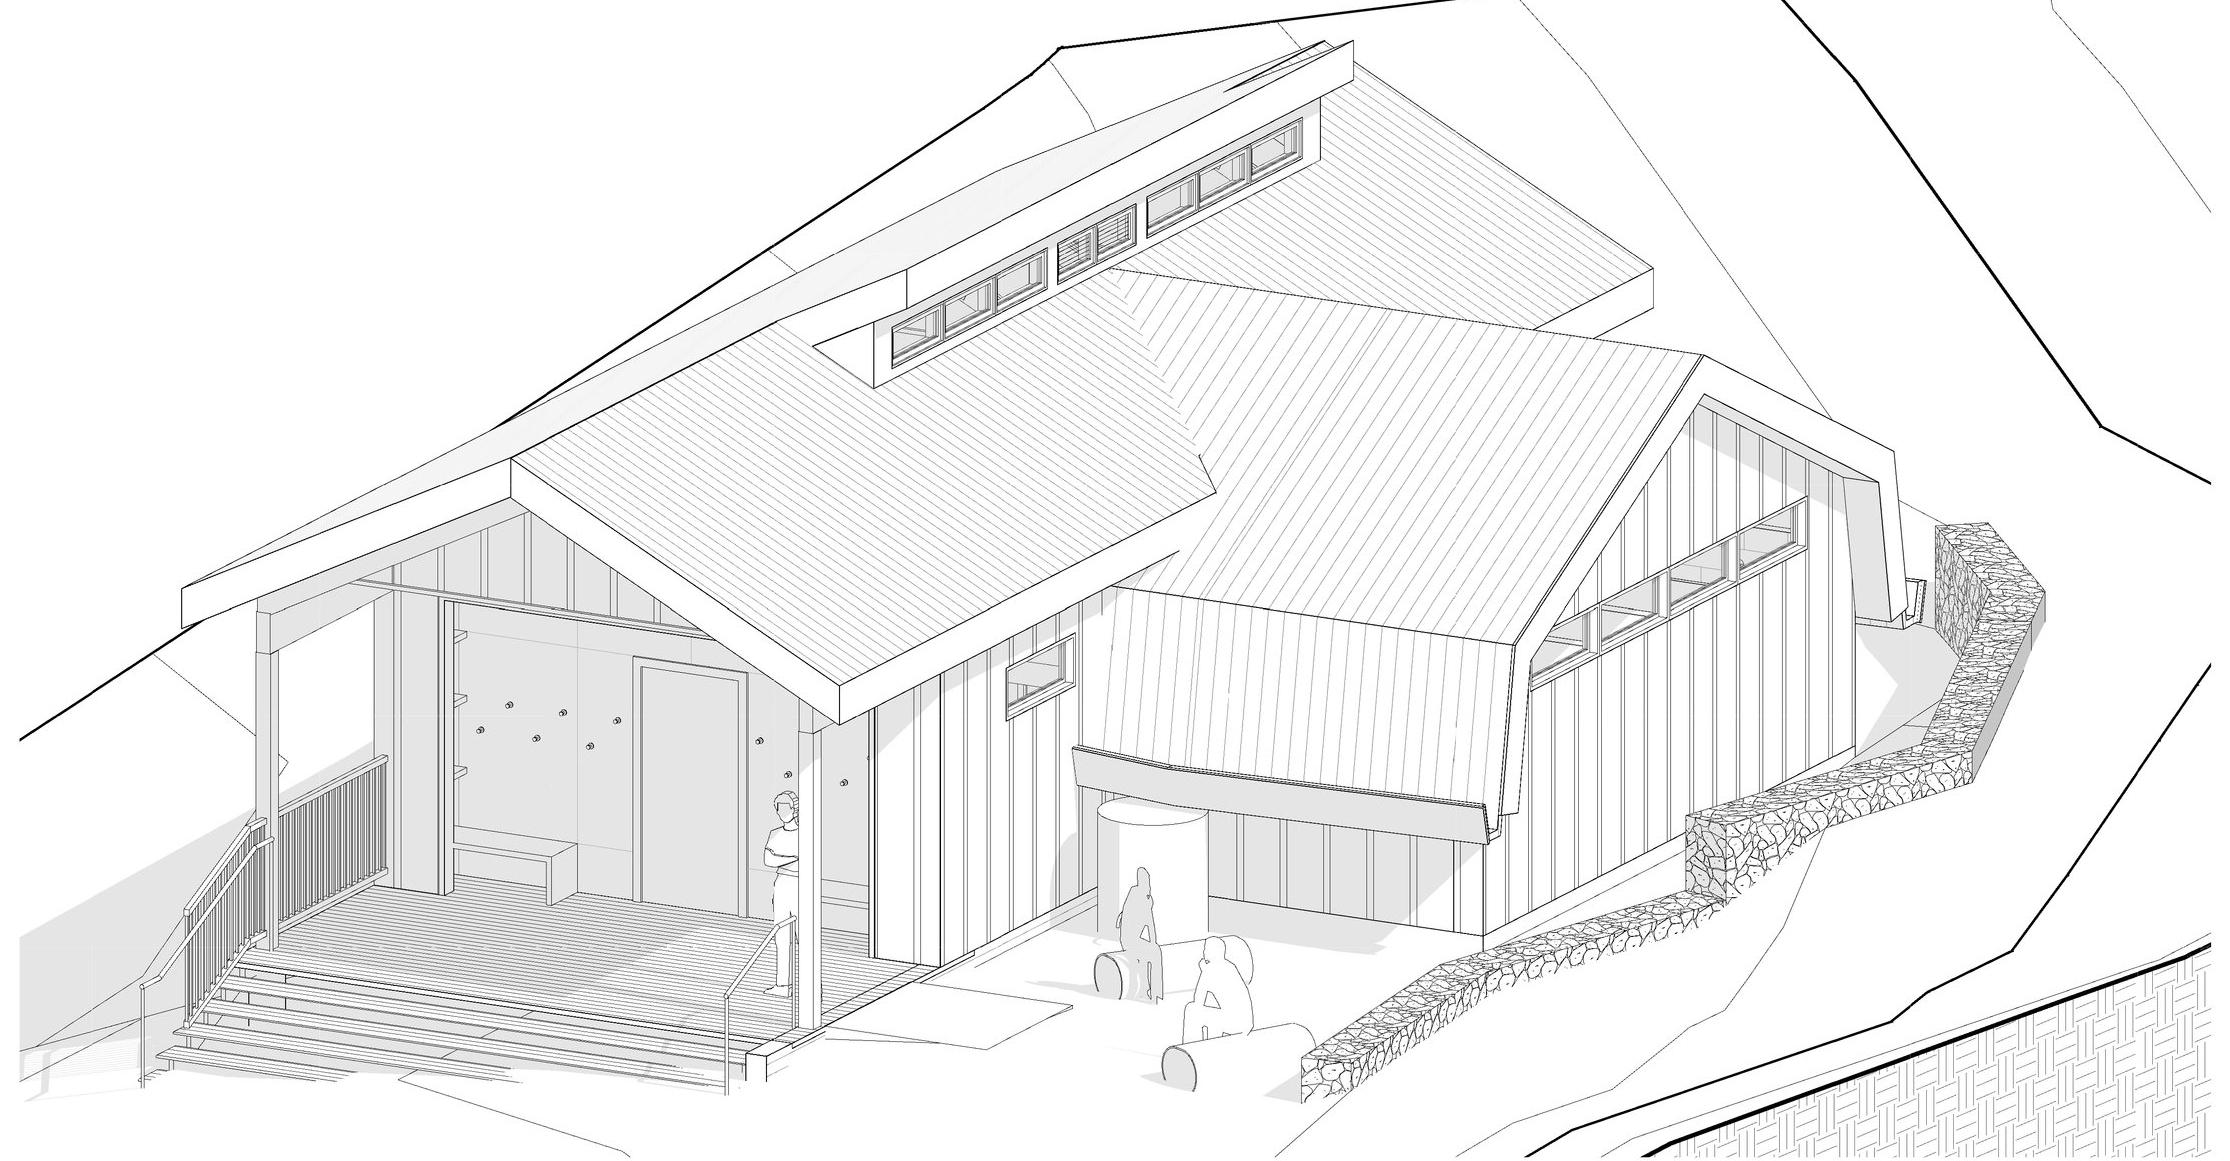 Cabin Design: Perspective